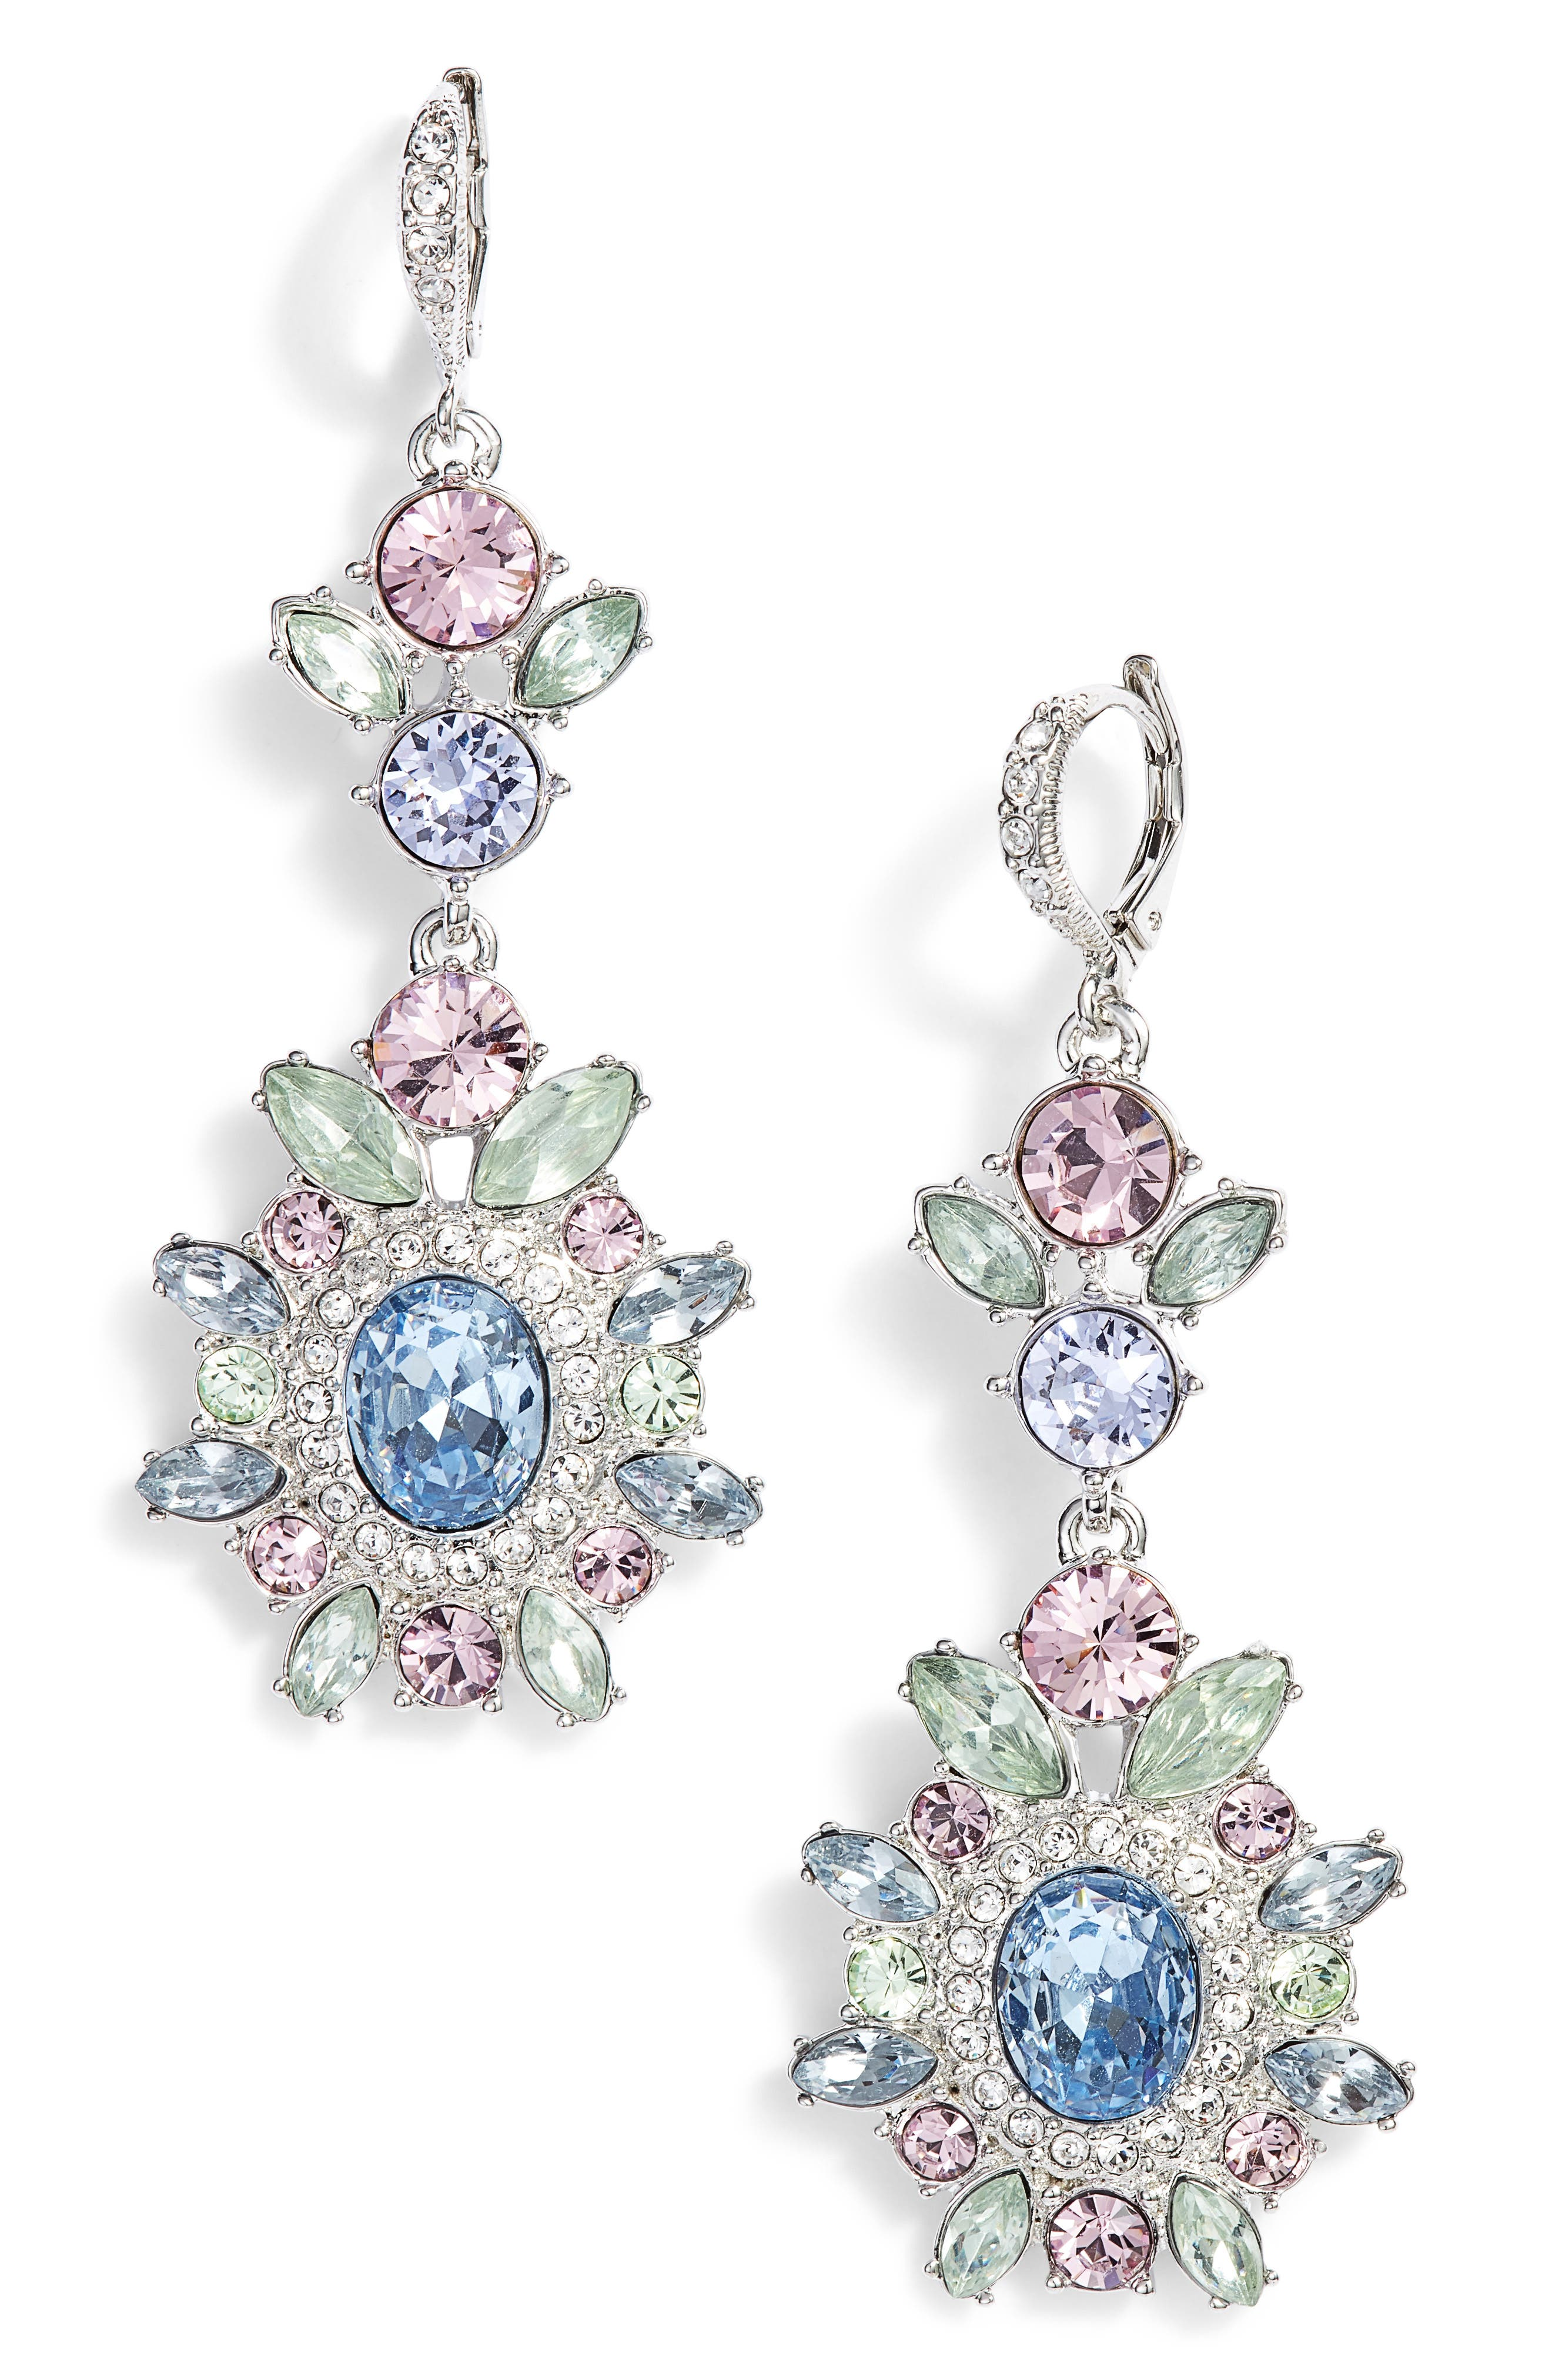 Large Double Drop Crystal Earrings,                             Main thumbnail 1, color,                             Rhodium/ Pastel Multi